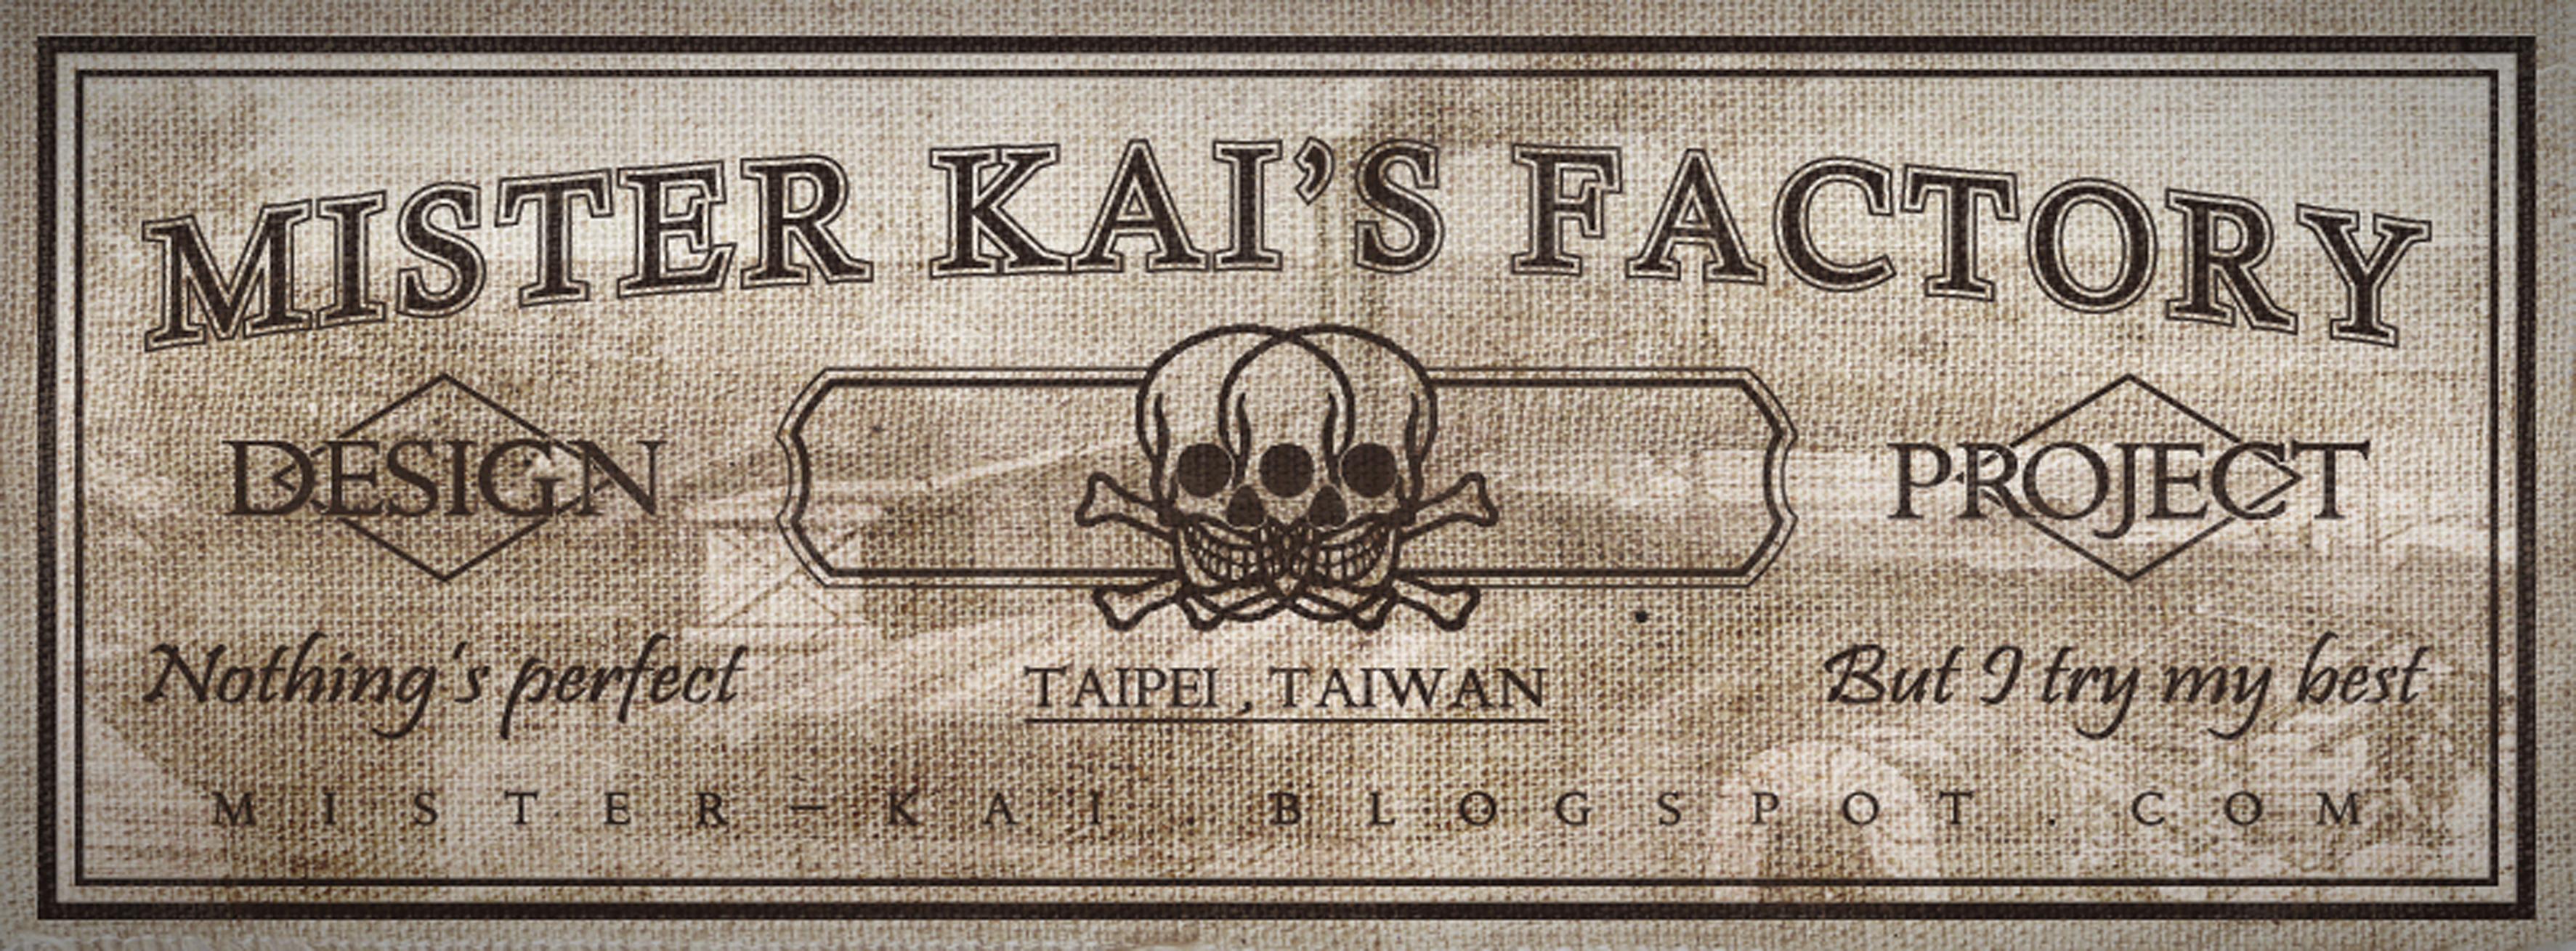 Mister Kai's Factory